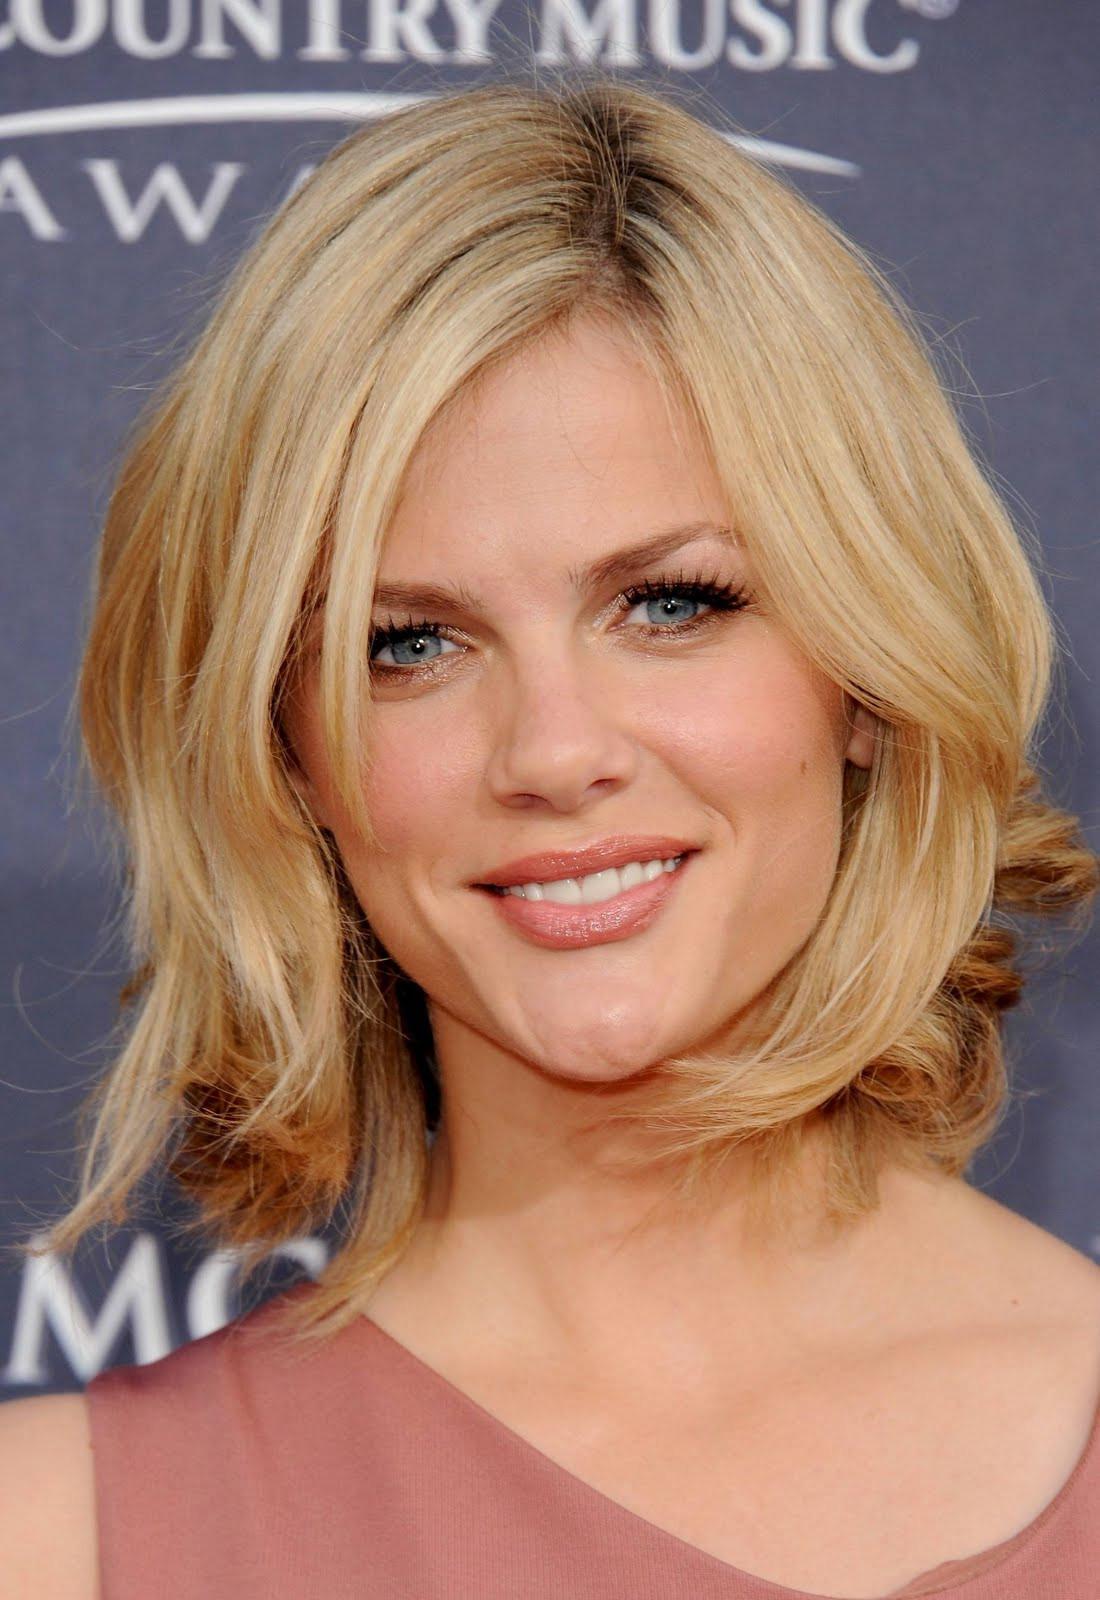 Layered Haircuts For Medium Length Hair  25 Best Layered Hairstyles For Medium Length Hair